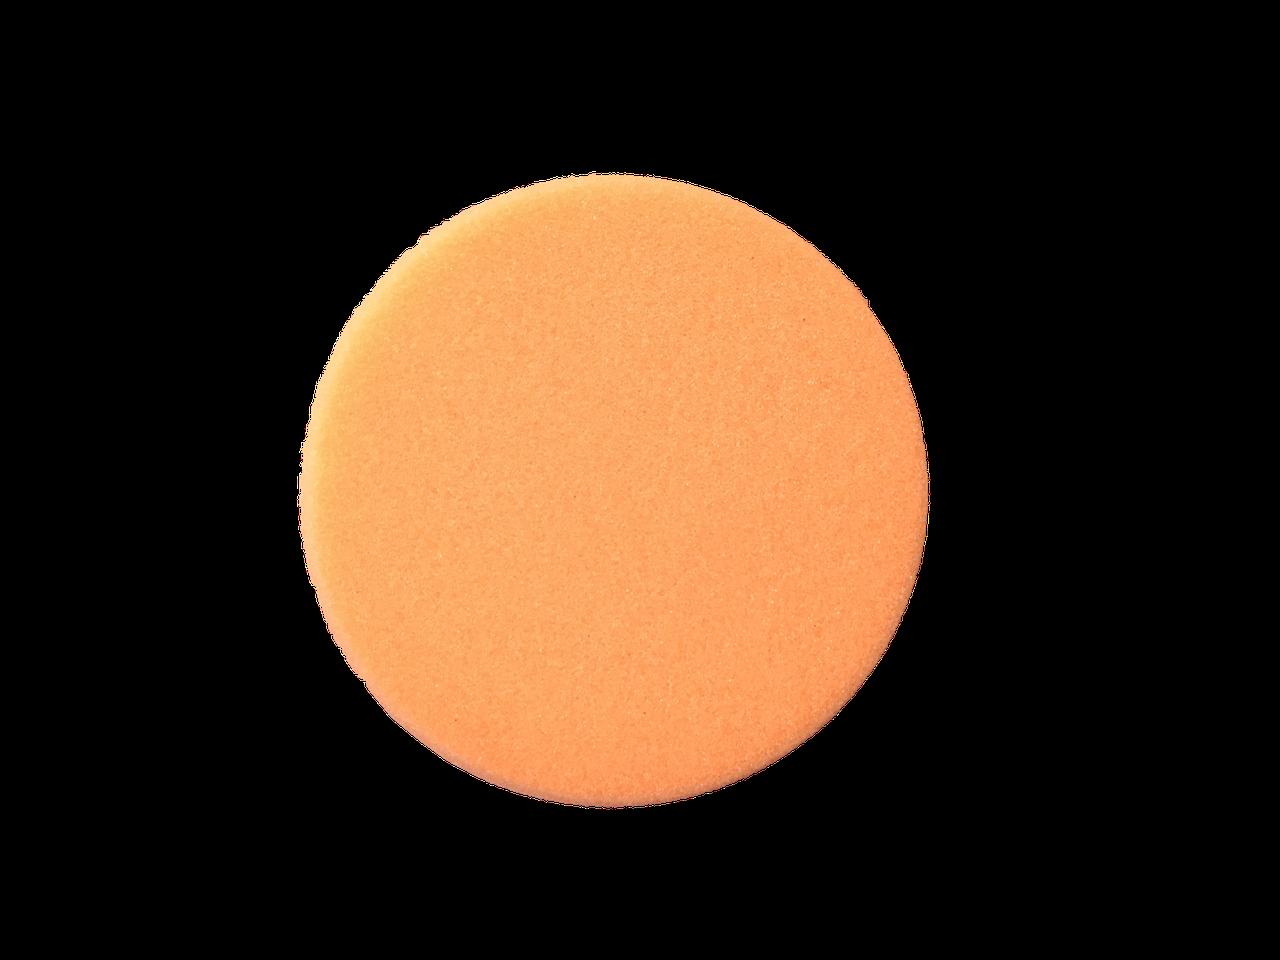 Полировальный круг антиголограммный - Koch Chemie 135х30 мм. оранжевый (999271)